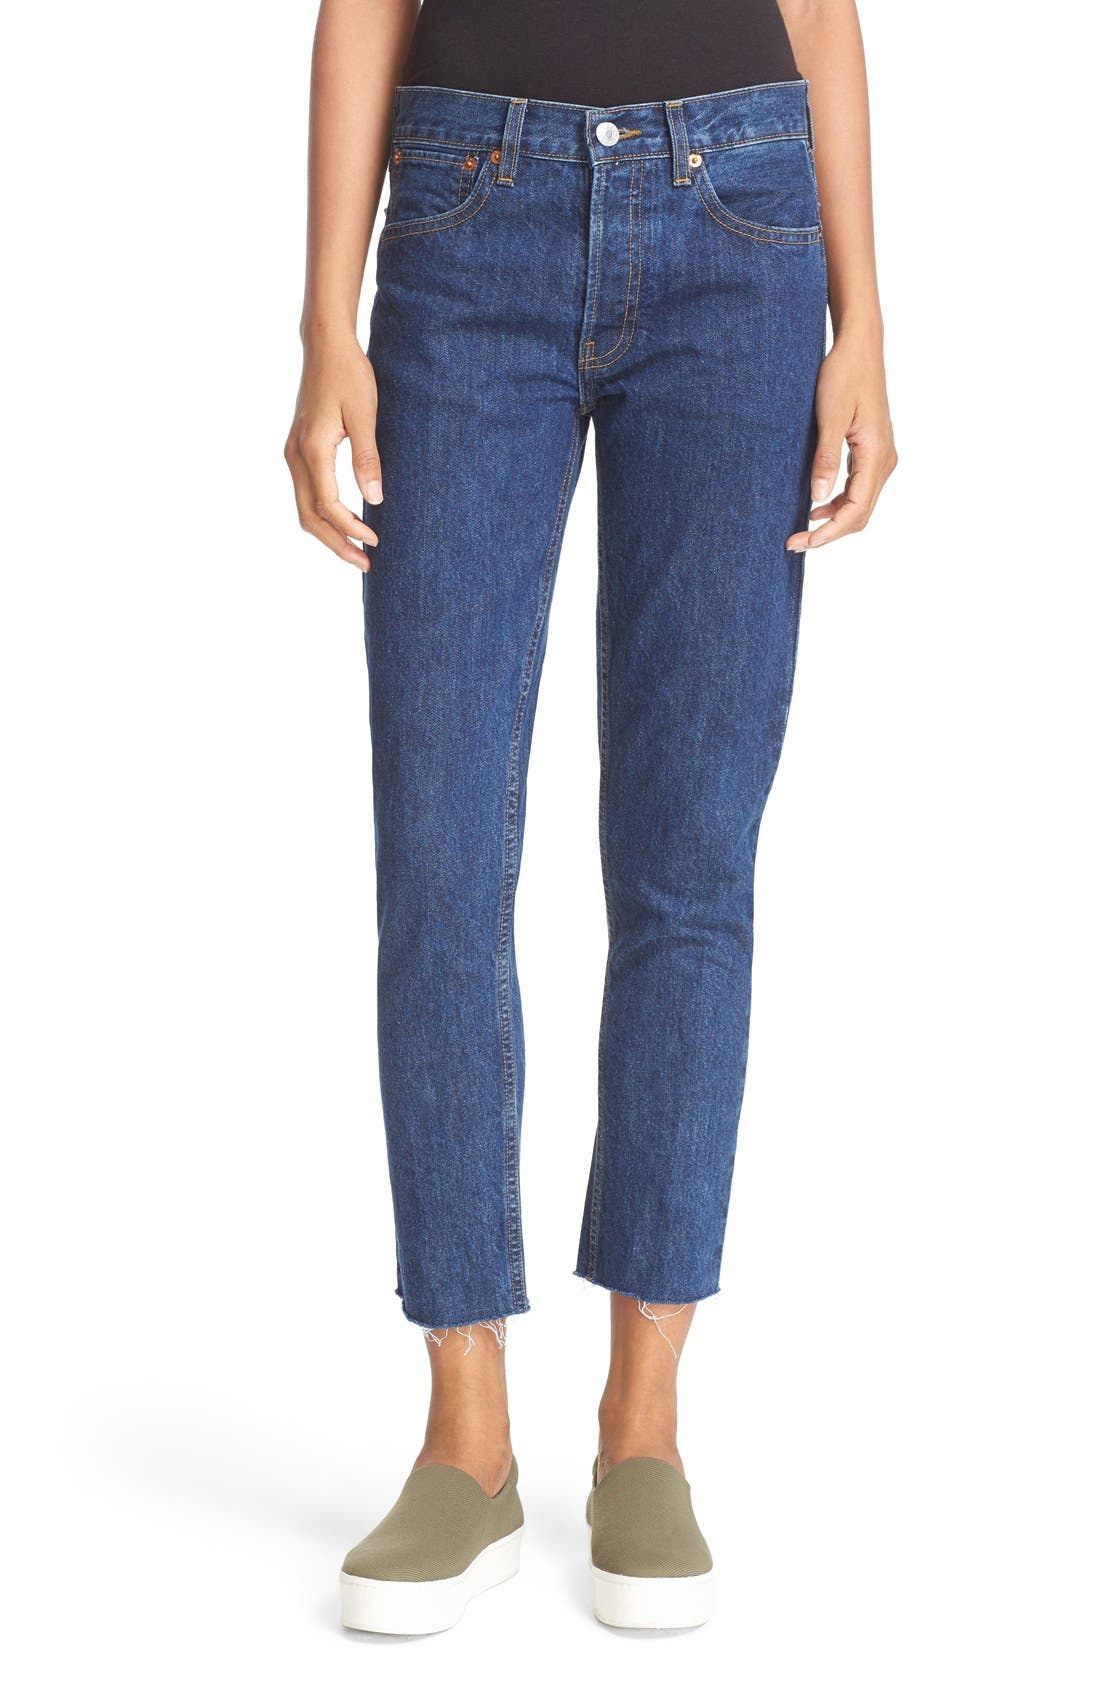 Main Image - Re/Done Originals High Waist Crop Jeans